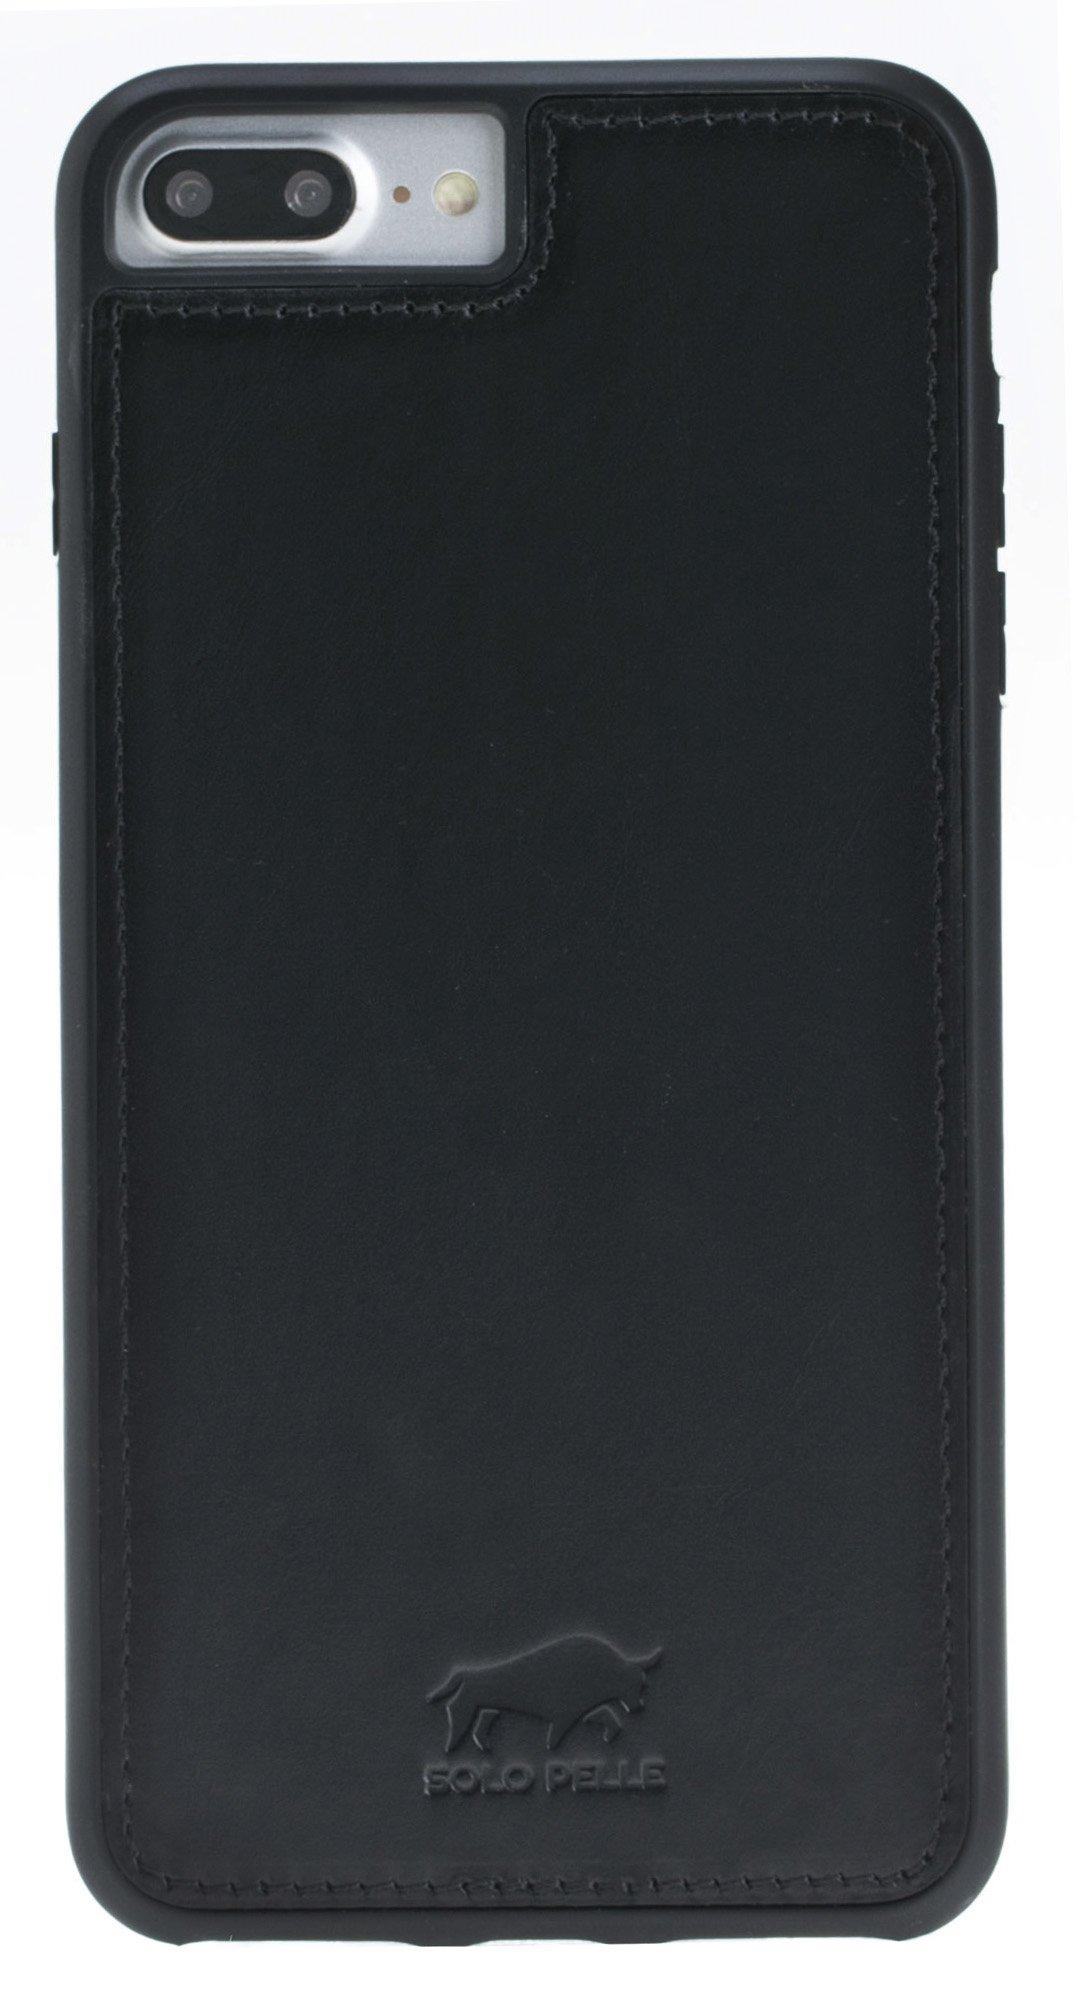 iphone 8 plus 7 plus h lle anehmbar 2in1 schwarz. Black Bedroom Furniture Sets. Home Design Ideas